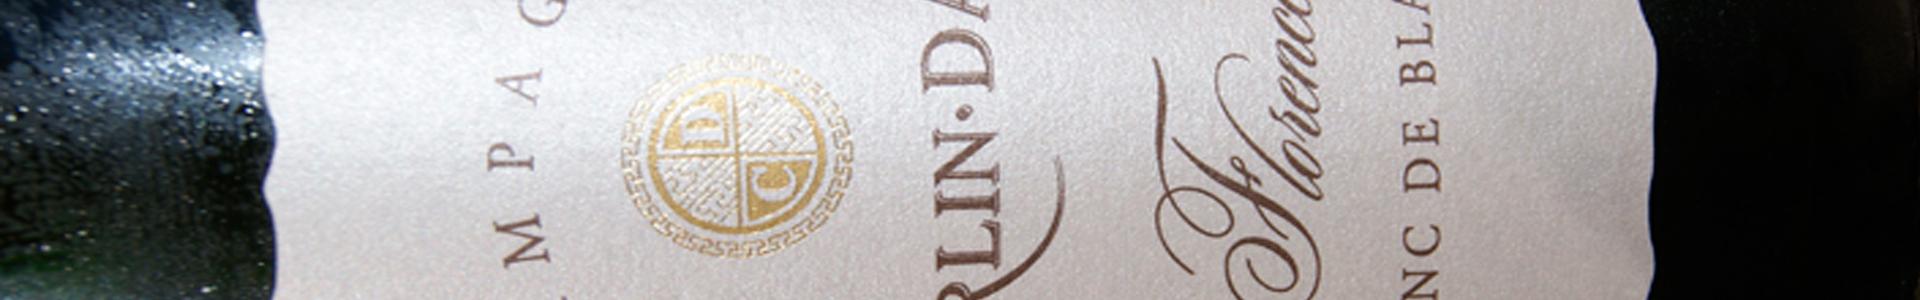 cheurlin dangin  champagne florence